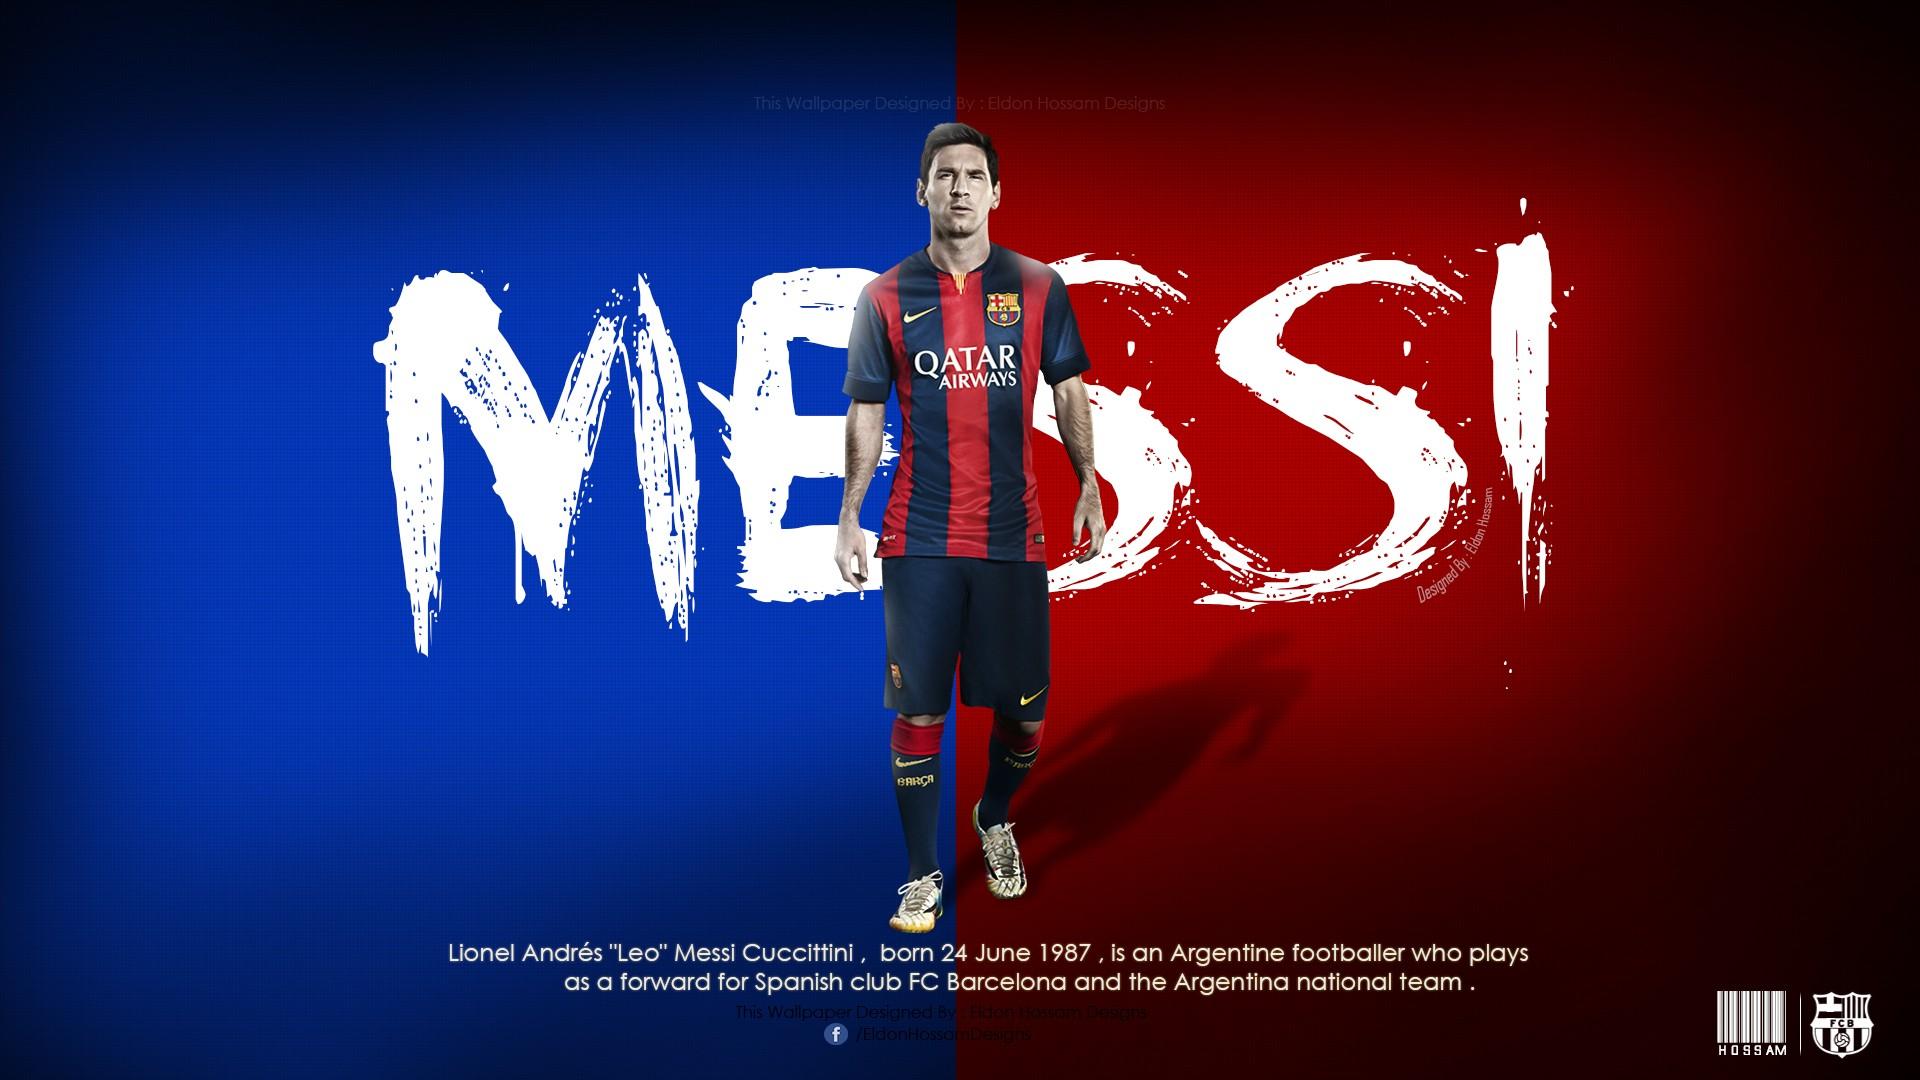 Best Lionel Messi Name Wallpaper Fc Barcelona Wallpaper - Barcelona Wallpaper 2017 , HD Wallpaper & Backgrounds